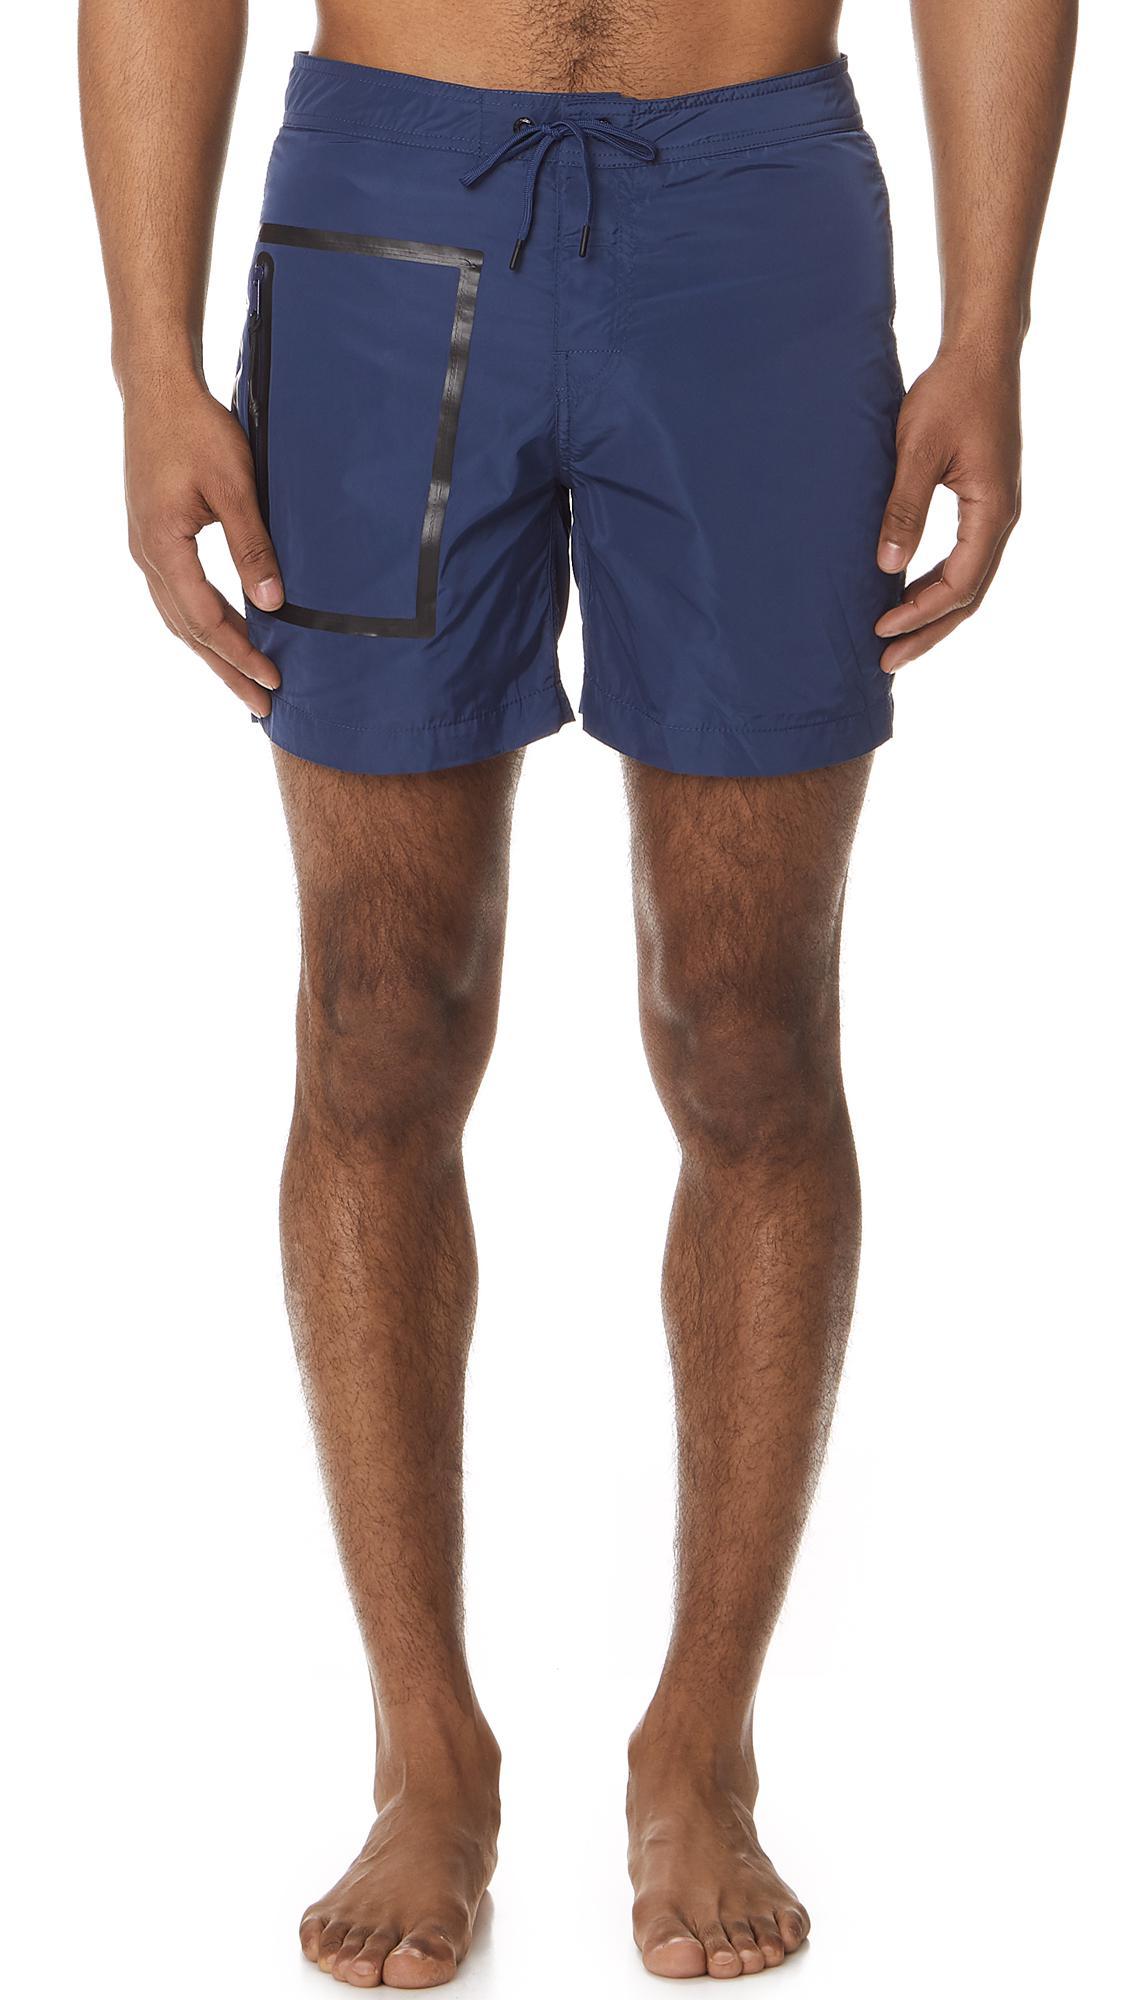 Lyst Long In Blue Swim Men Sundek Fixed With Waistband For Shorts 4rq4agO5